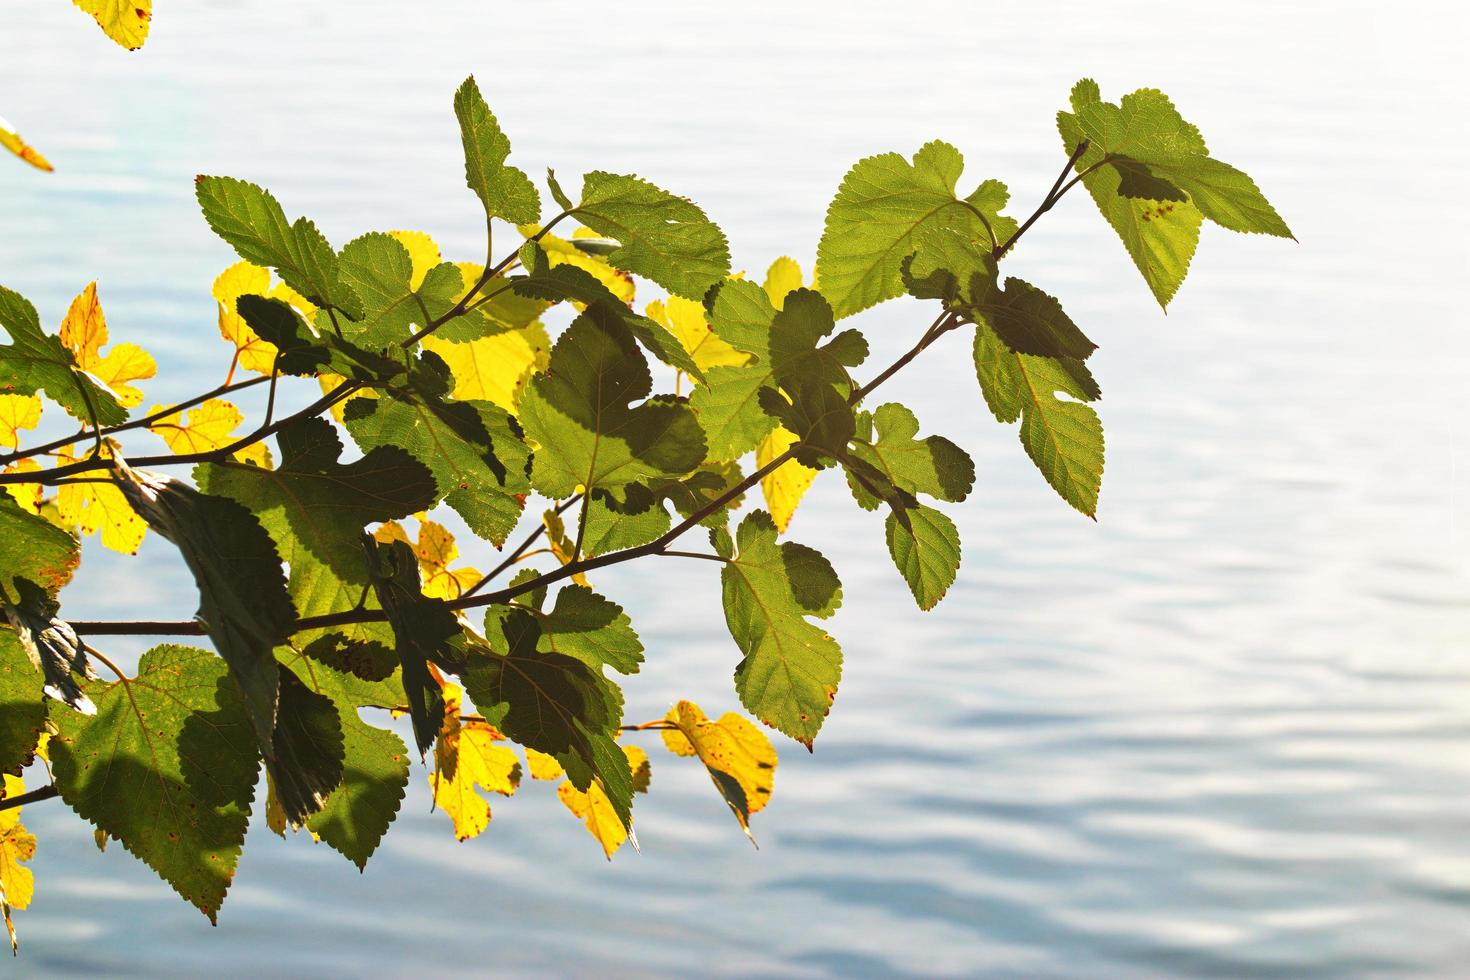 boomtakjes boven water foto